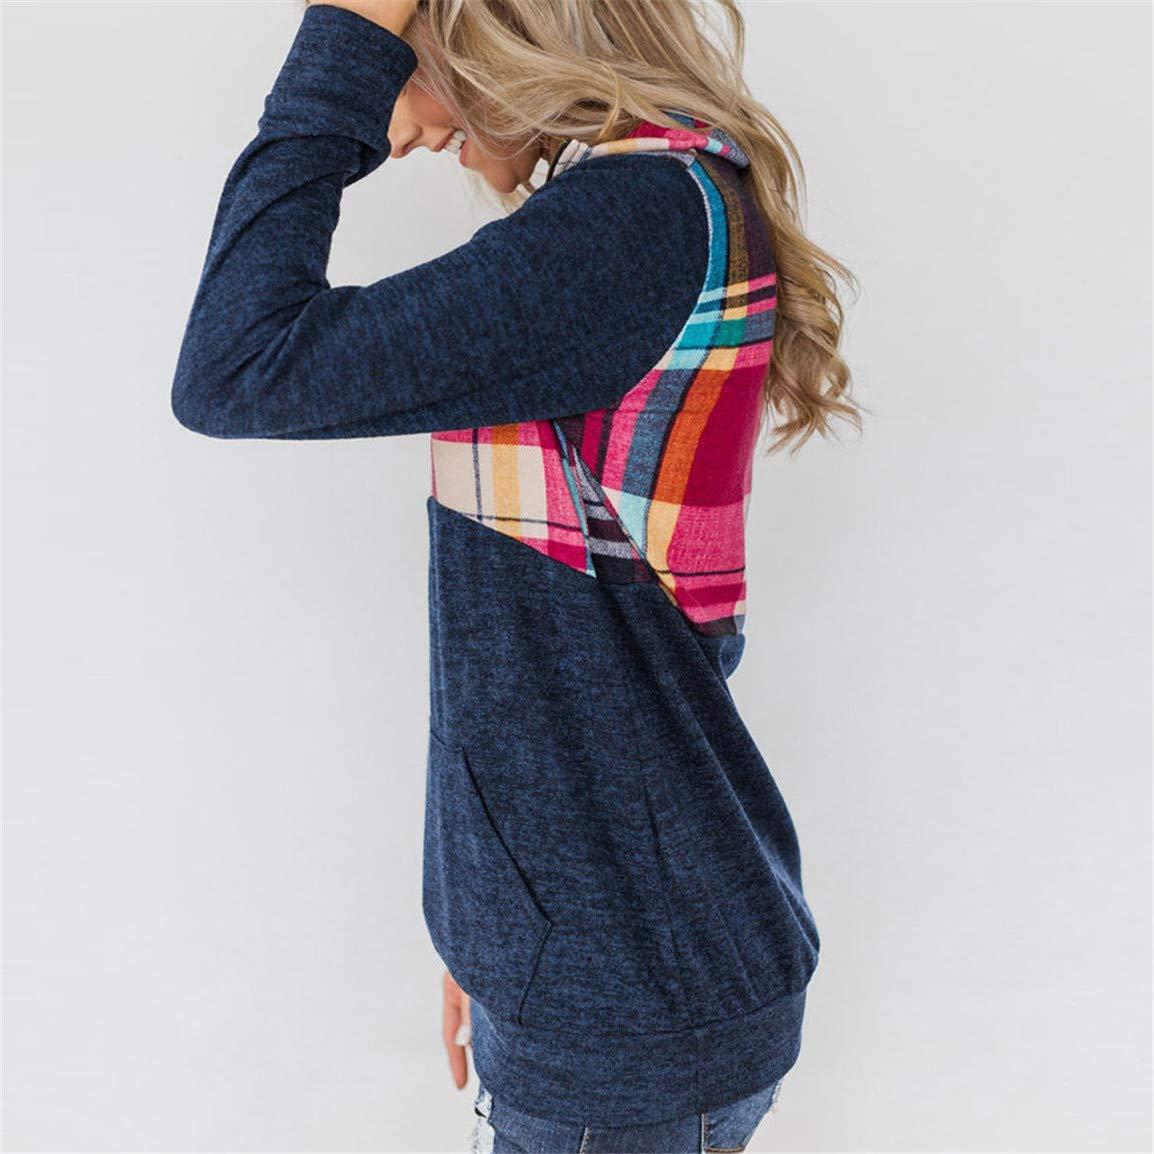 Damen Langarm Kapuzenbluse Damen Patchwork Pullover Asymmetric Hem Wrap Kapuzenshirt Outwear Tops Moonuy